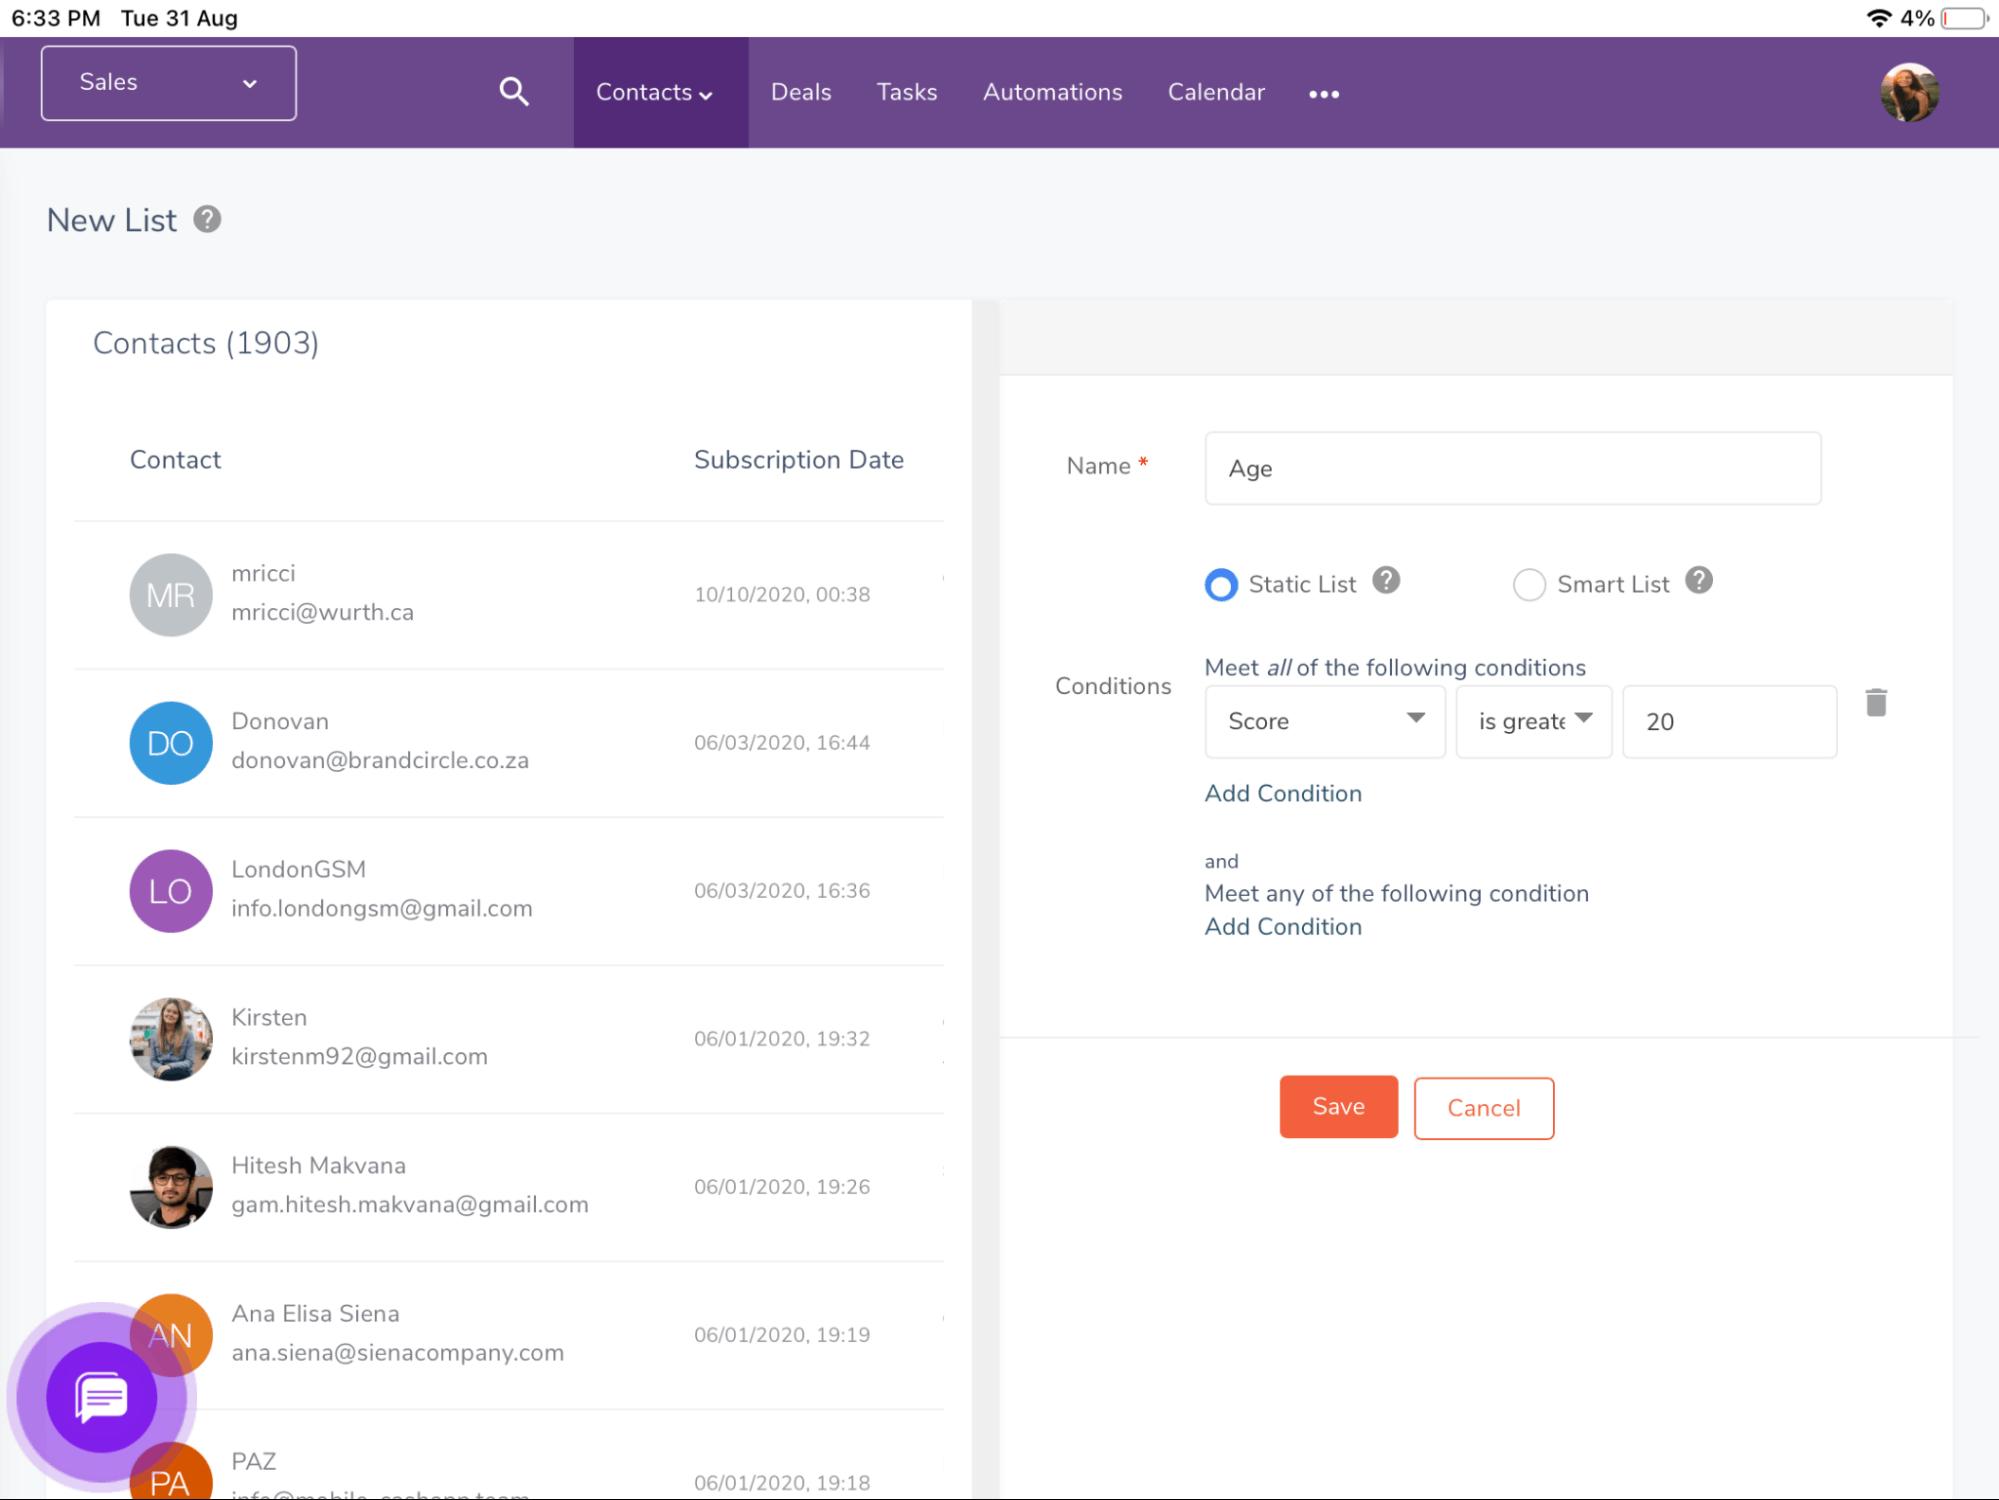 EngageBay smart list segmentation